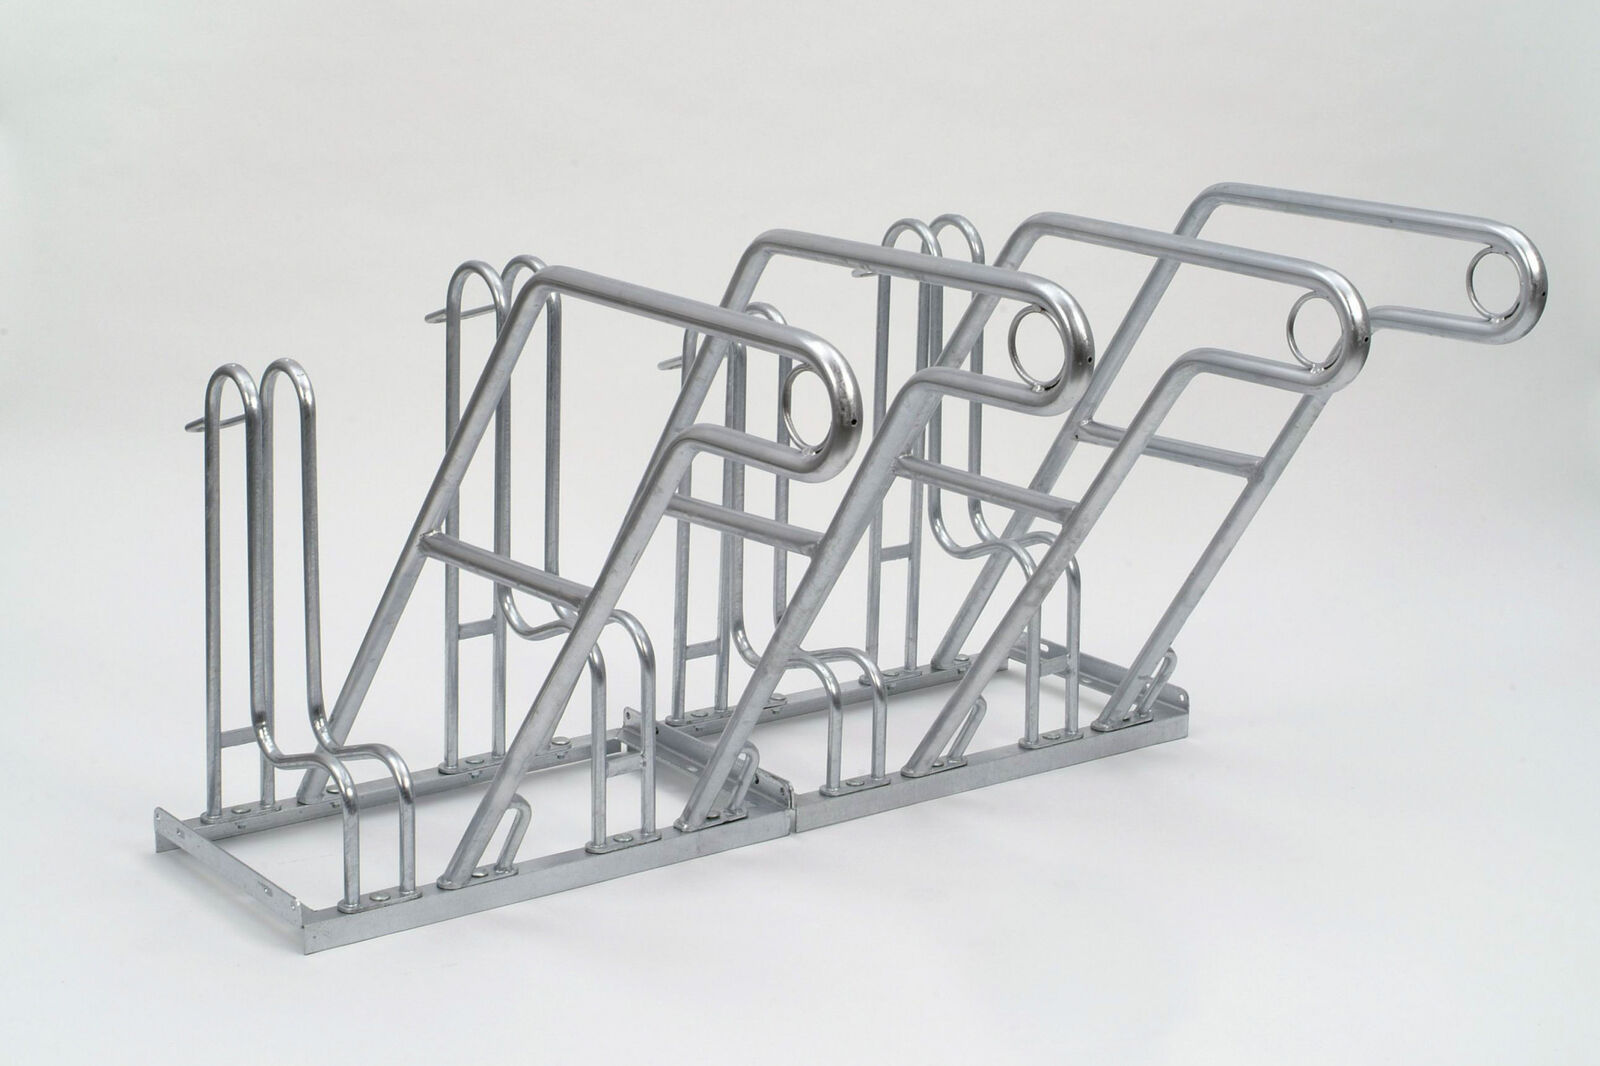 Fahrrad Anlehnsystem 4606 2100mm   Fahrradständer   für Außen   6 Plätze